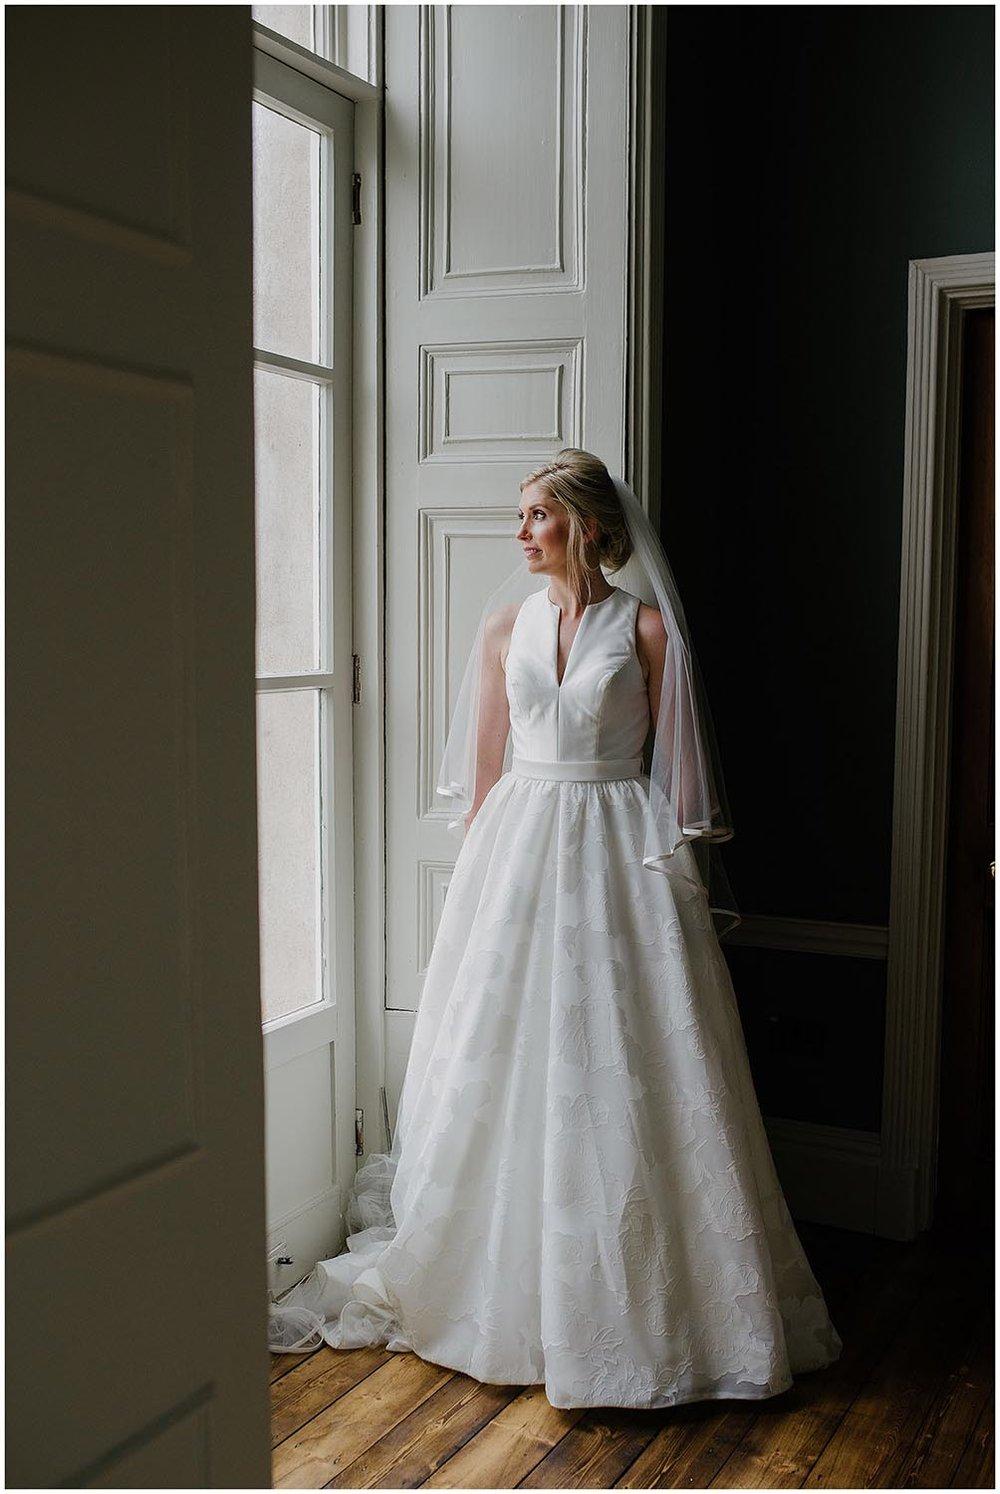 farnham-estate-Irish-wedding-photographer-jude-browne-photography_0333.JPG